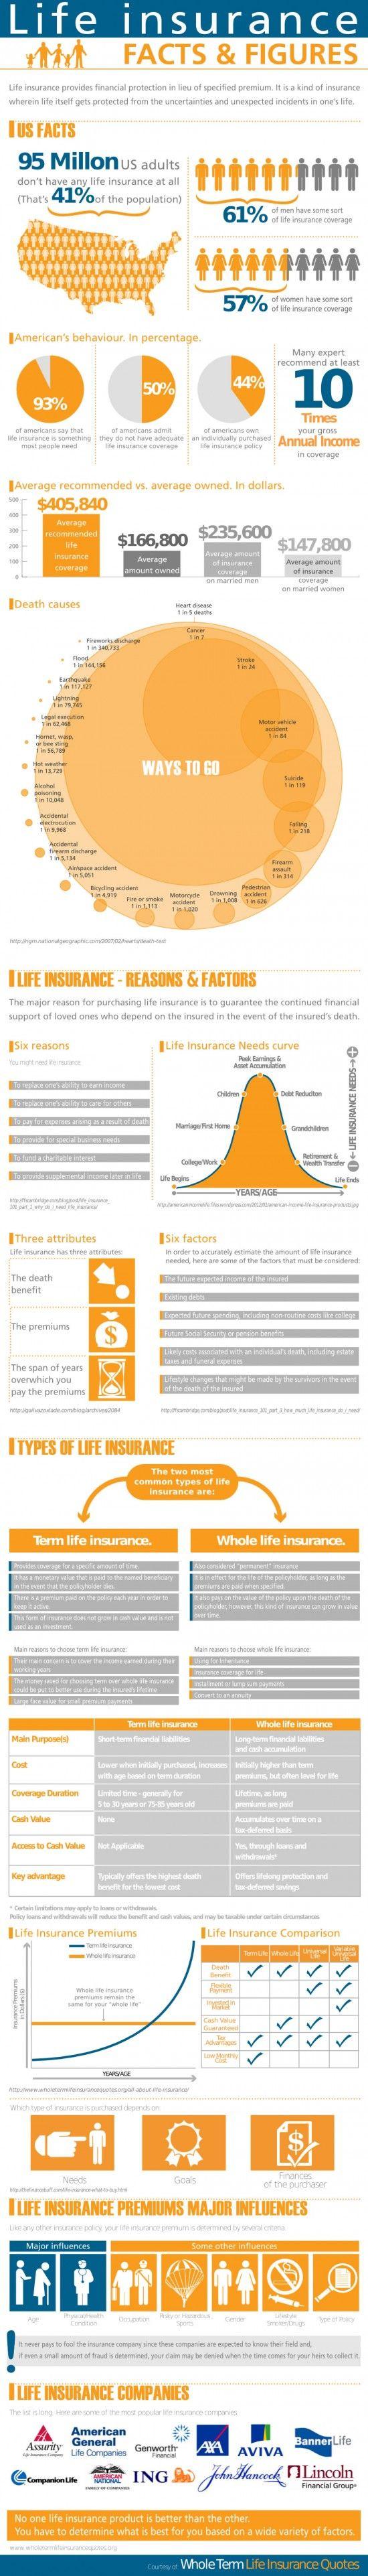 LIFE INSURANCE FACTS & FIGUREShttp://www.riograndeins.com/insurance-life.htm